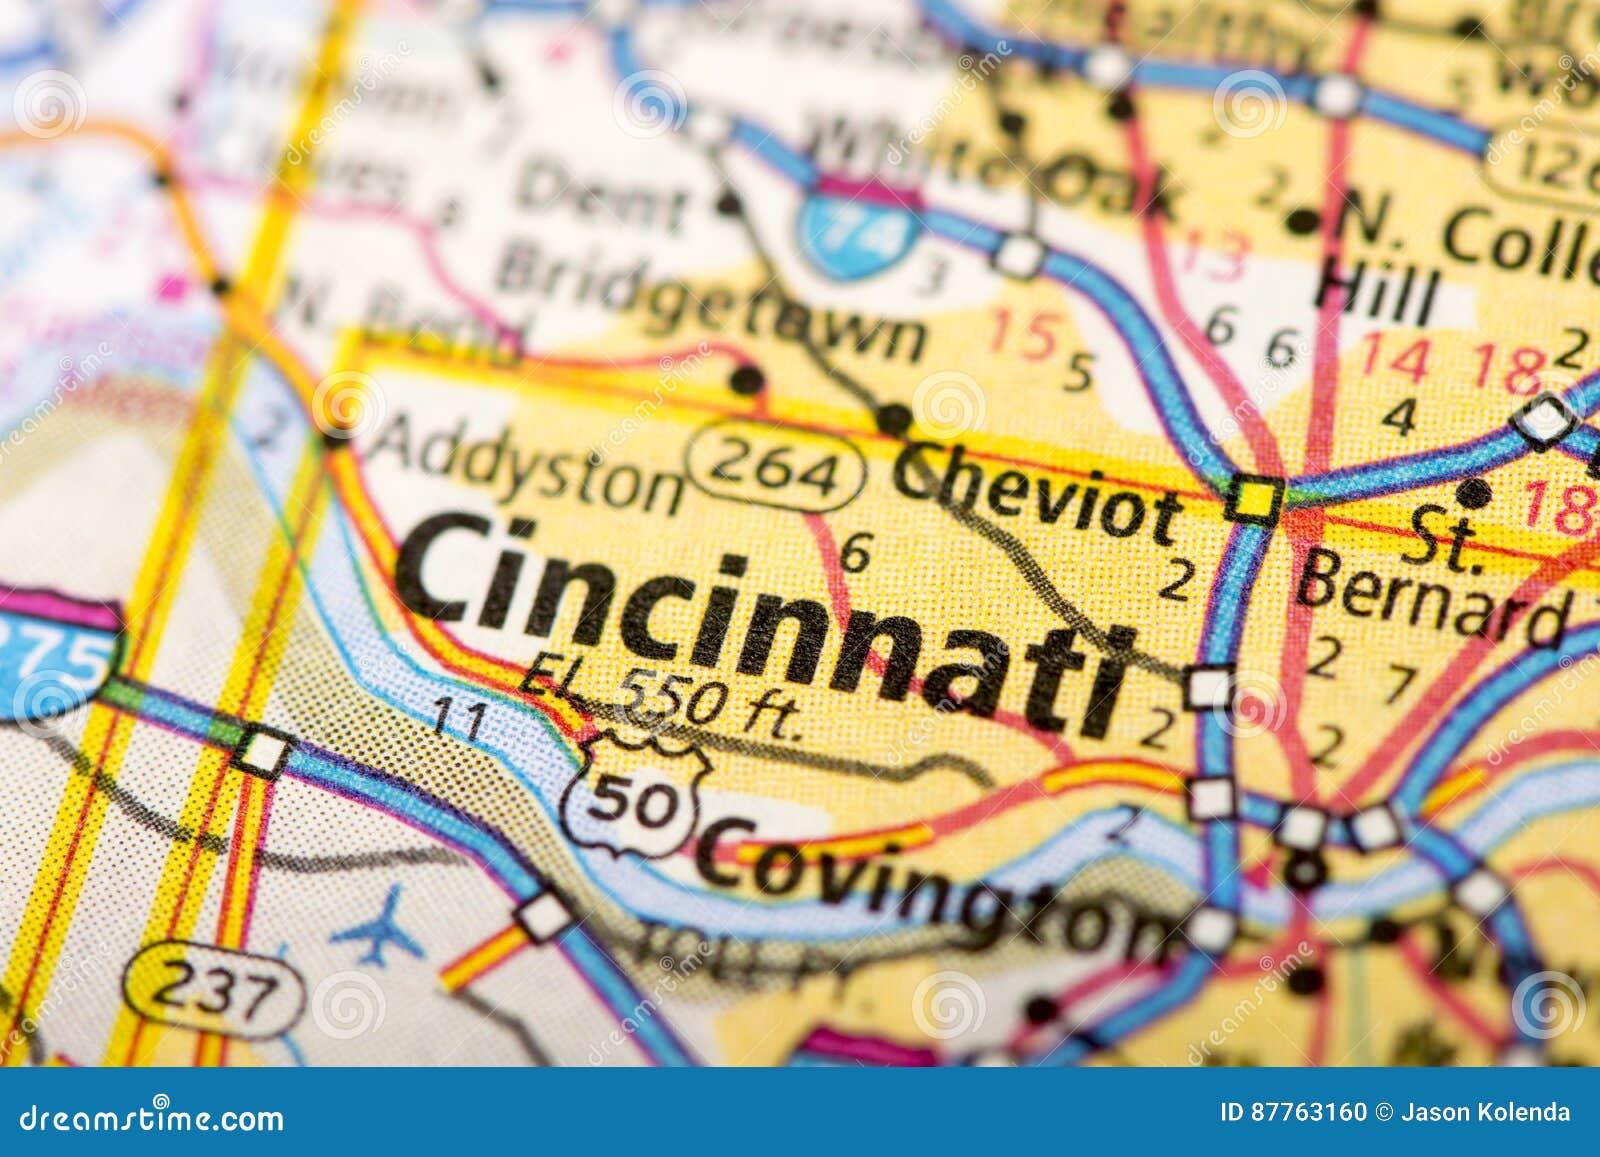 Cincinnati, Ohio on map stock photo. Image of country - 87763160